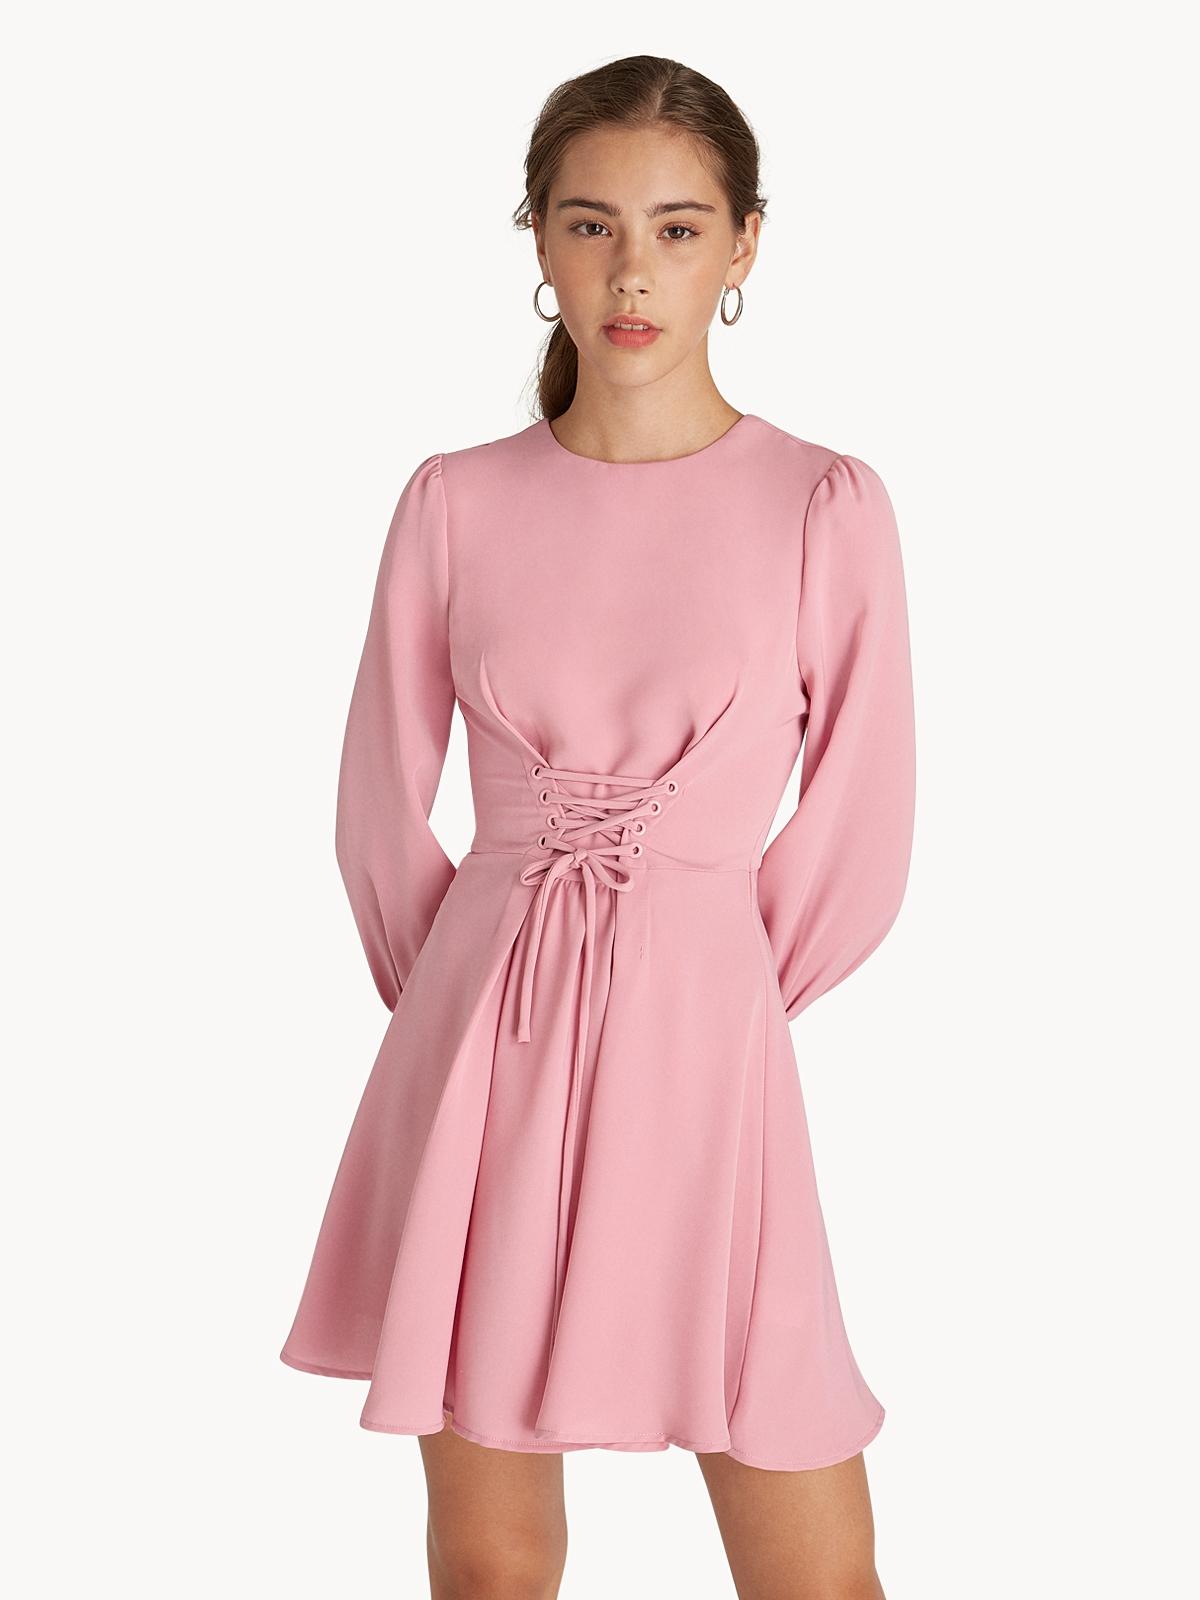 15671cb8b6d Mini Corset Lace Up Dress - Pink - Pomelo Fashion